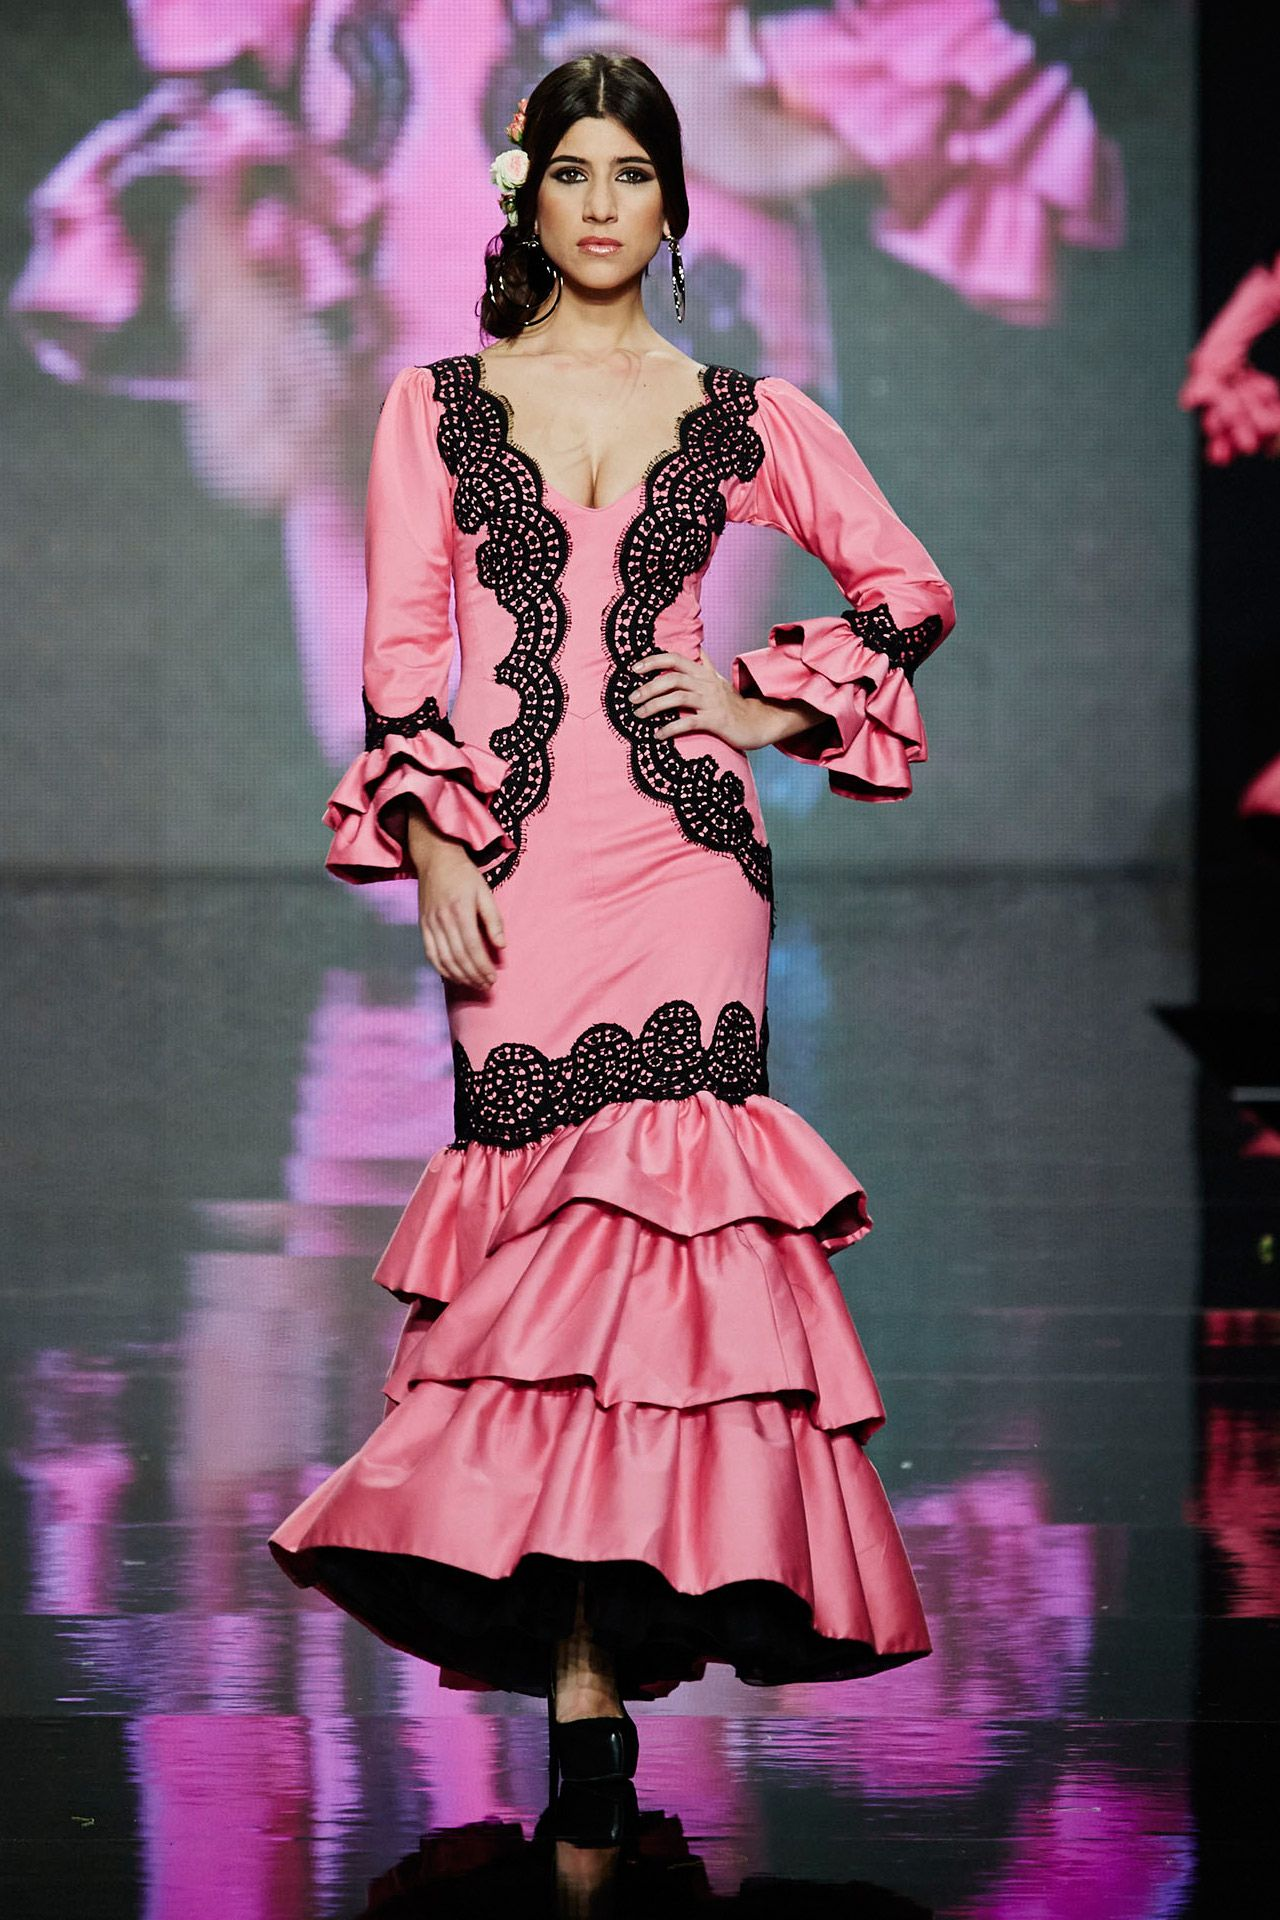 Pin de Andrea Martínez en Traje Flamenca mujer | Pinterest ...